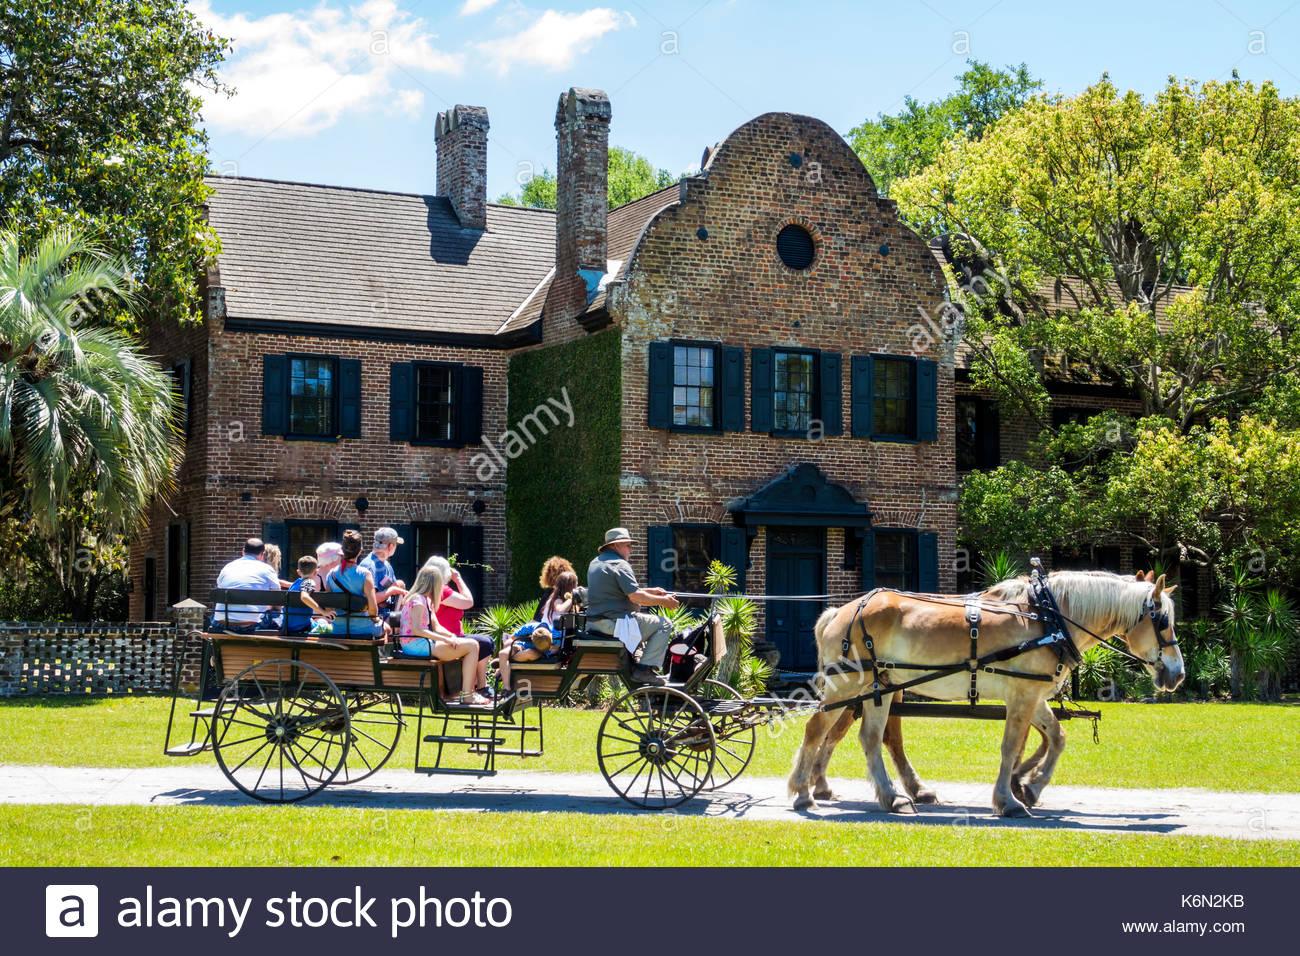 Charleston South Carolina SC Middleton Place National Historic Landmark Ashley River rice plantation antebellum 1730 garden horse-drawn carriage guide - Stock Image